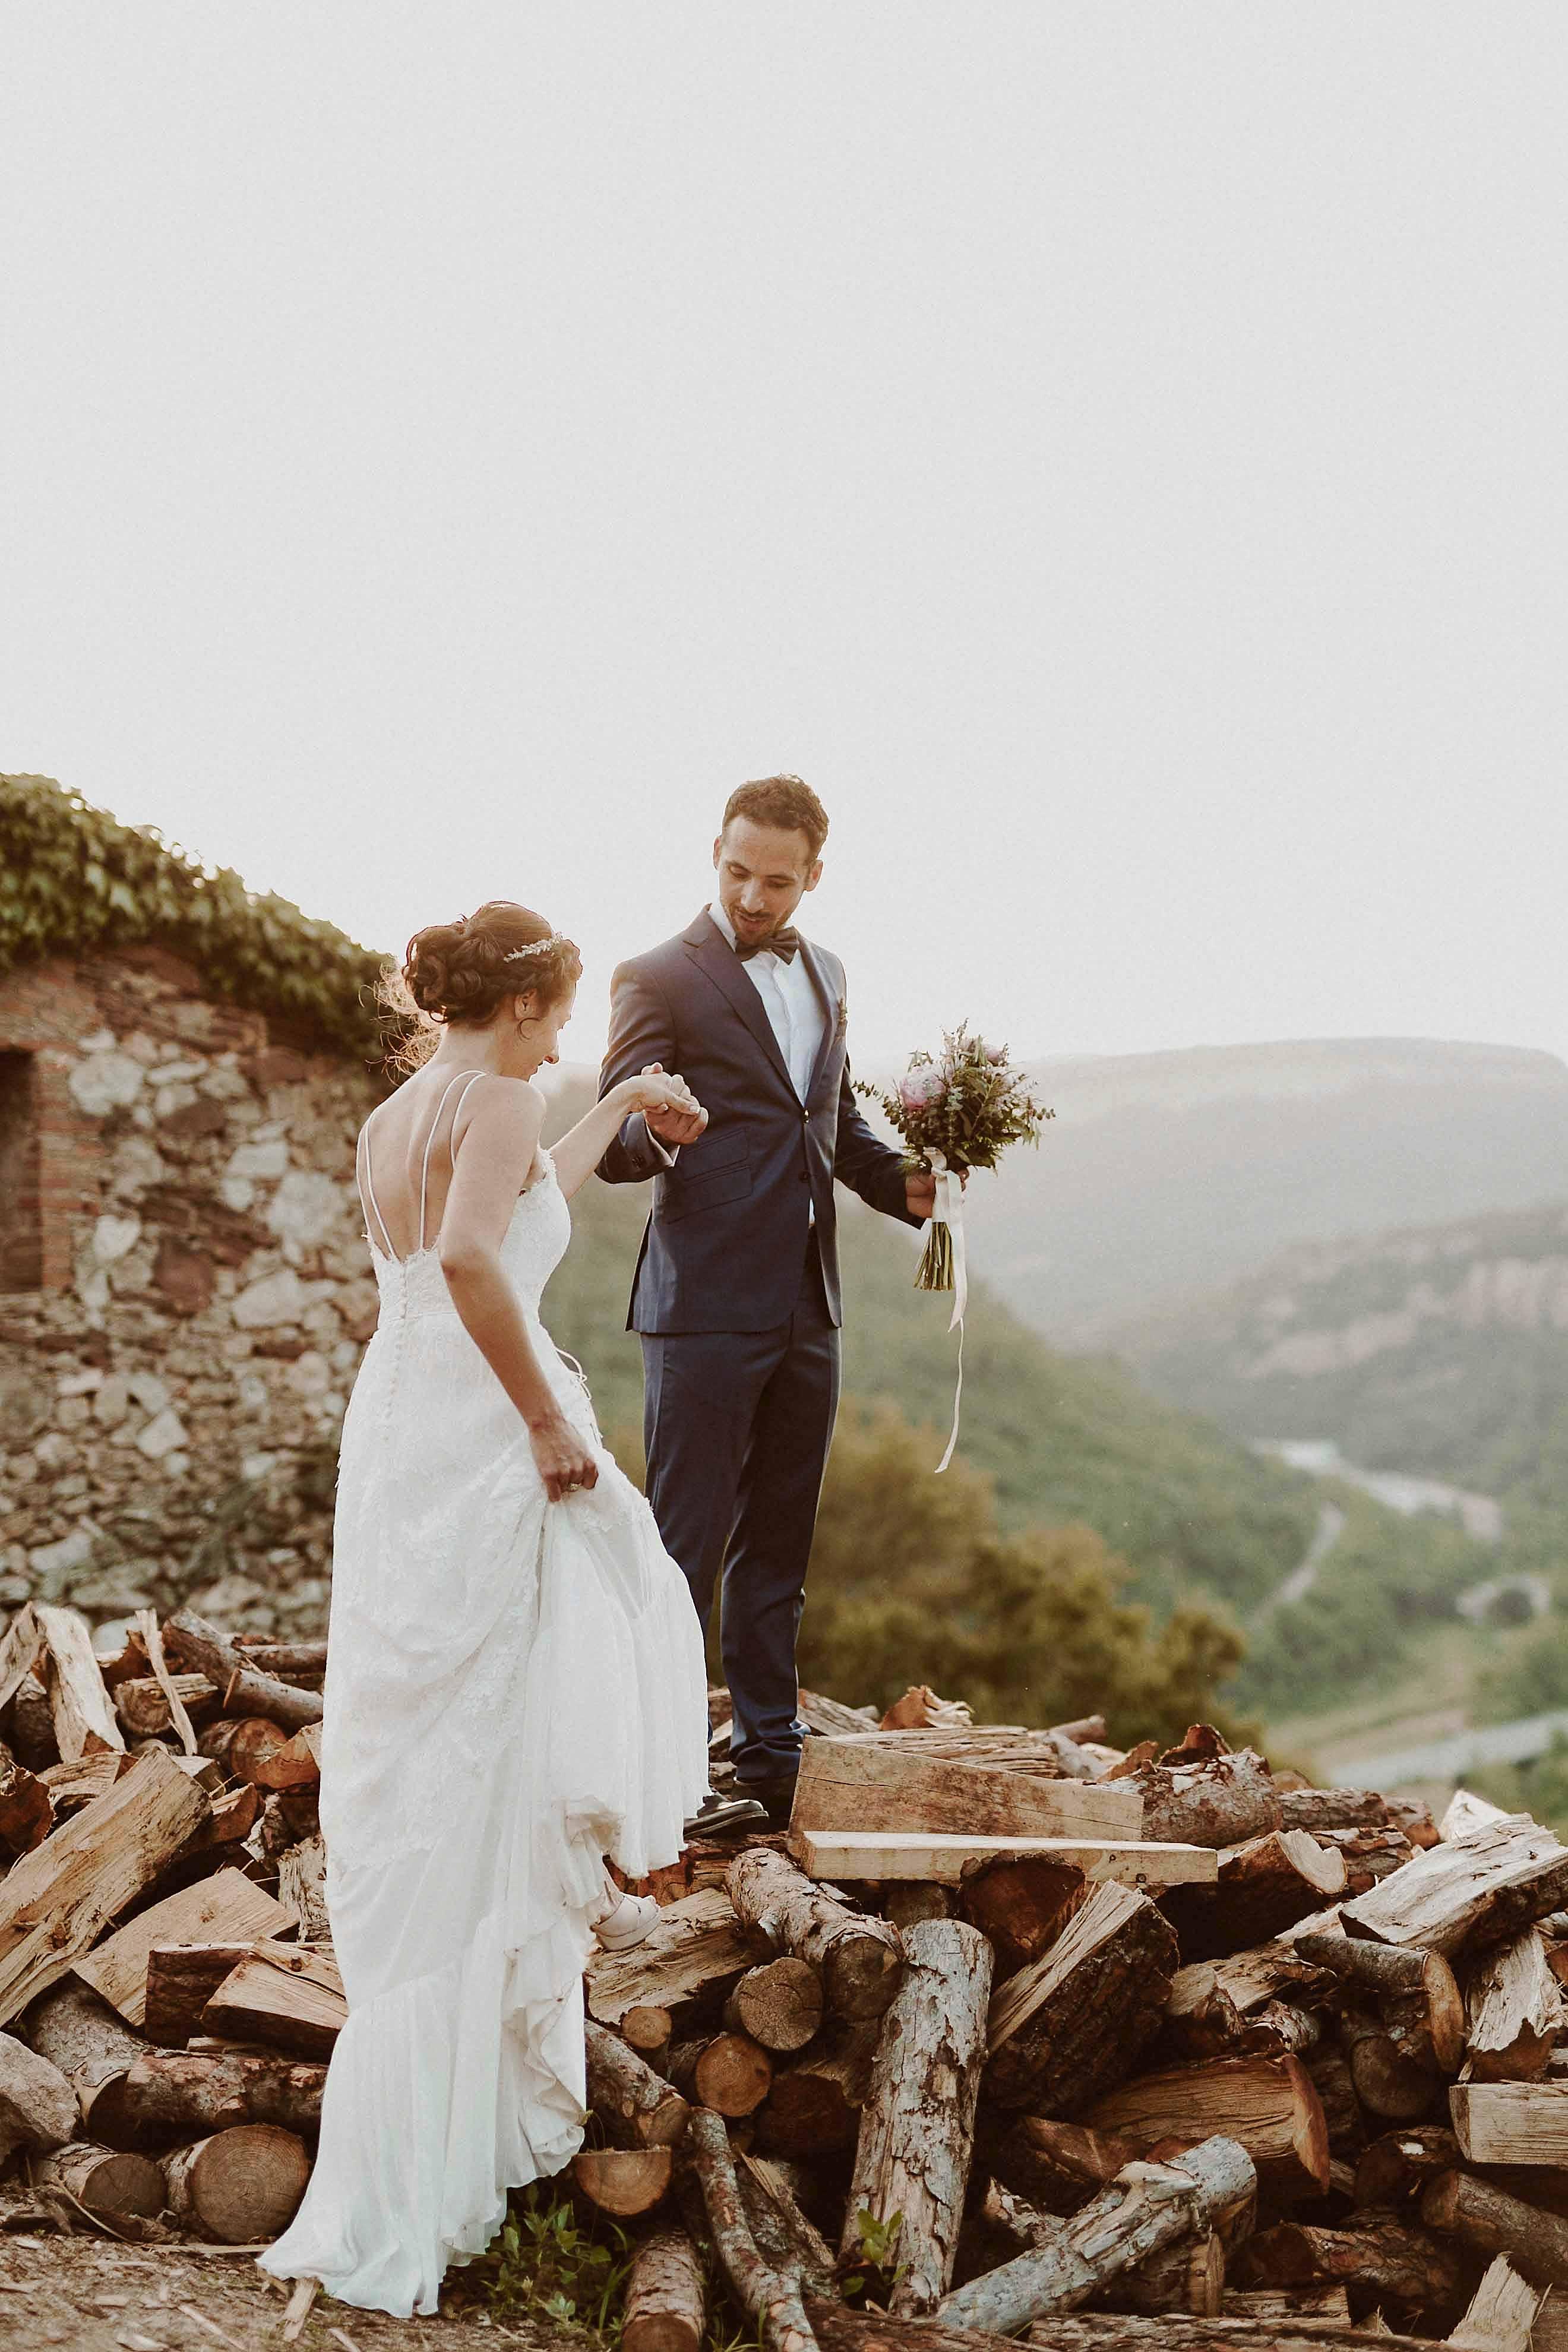 Boda rústica en la montaña. fotgrafo de bodas barcelona_080